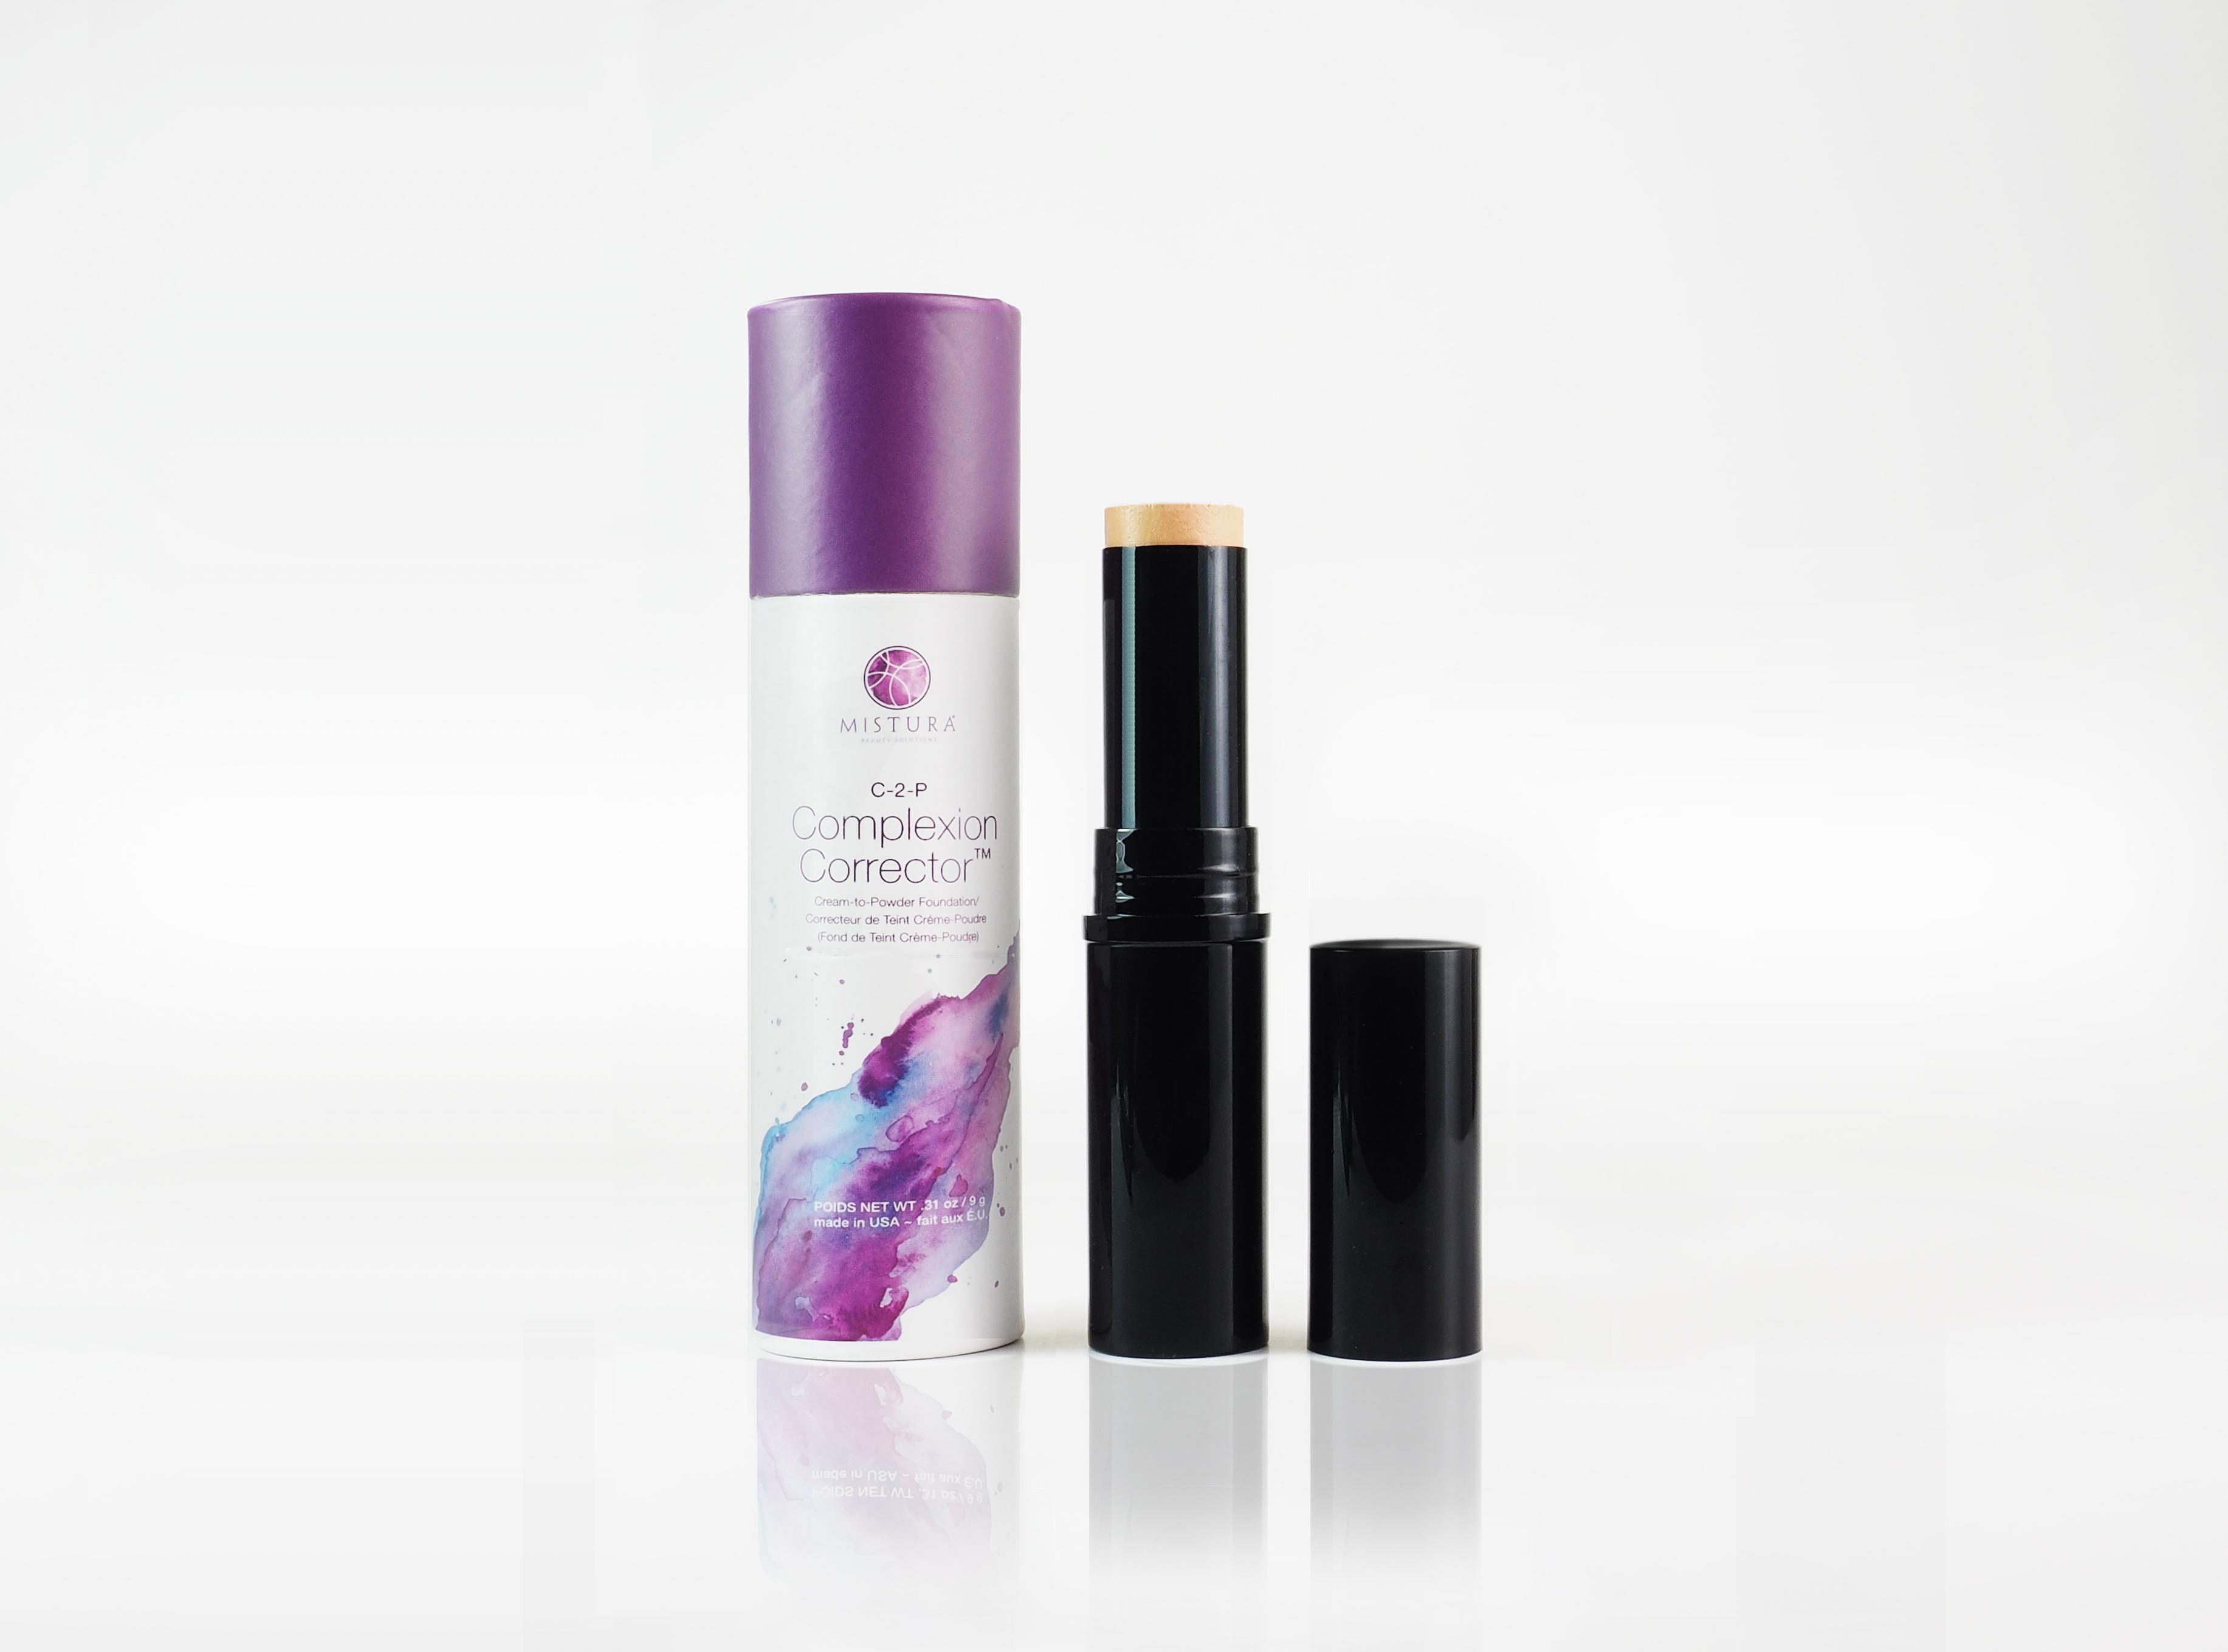 Mistura Beauty Complexion Corrector